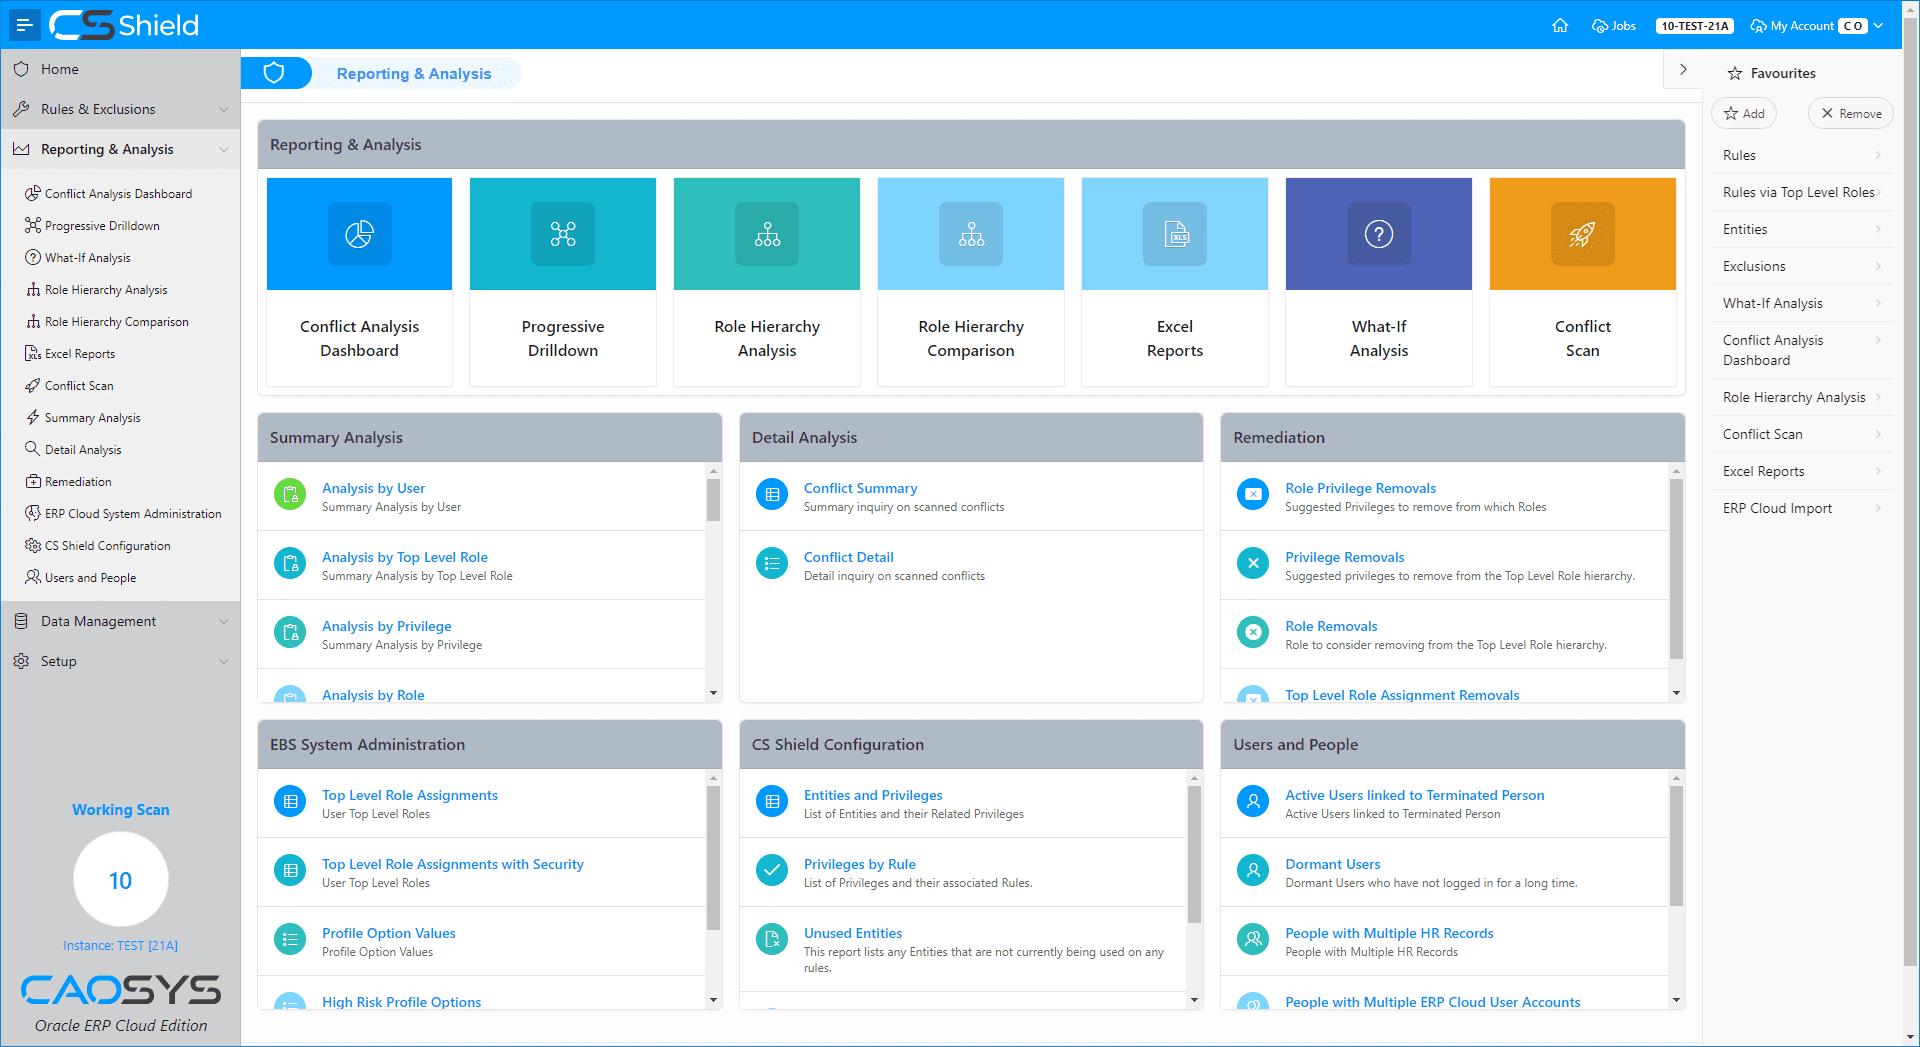 CS Shield ERP Cloud Edition - Comprehensive Reporting & Analysis